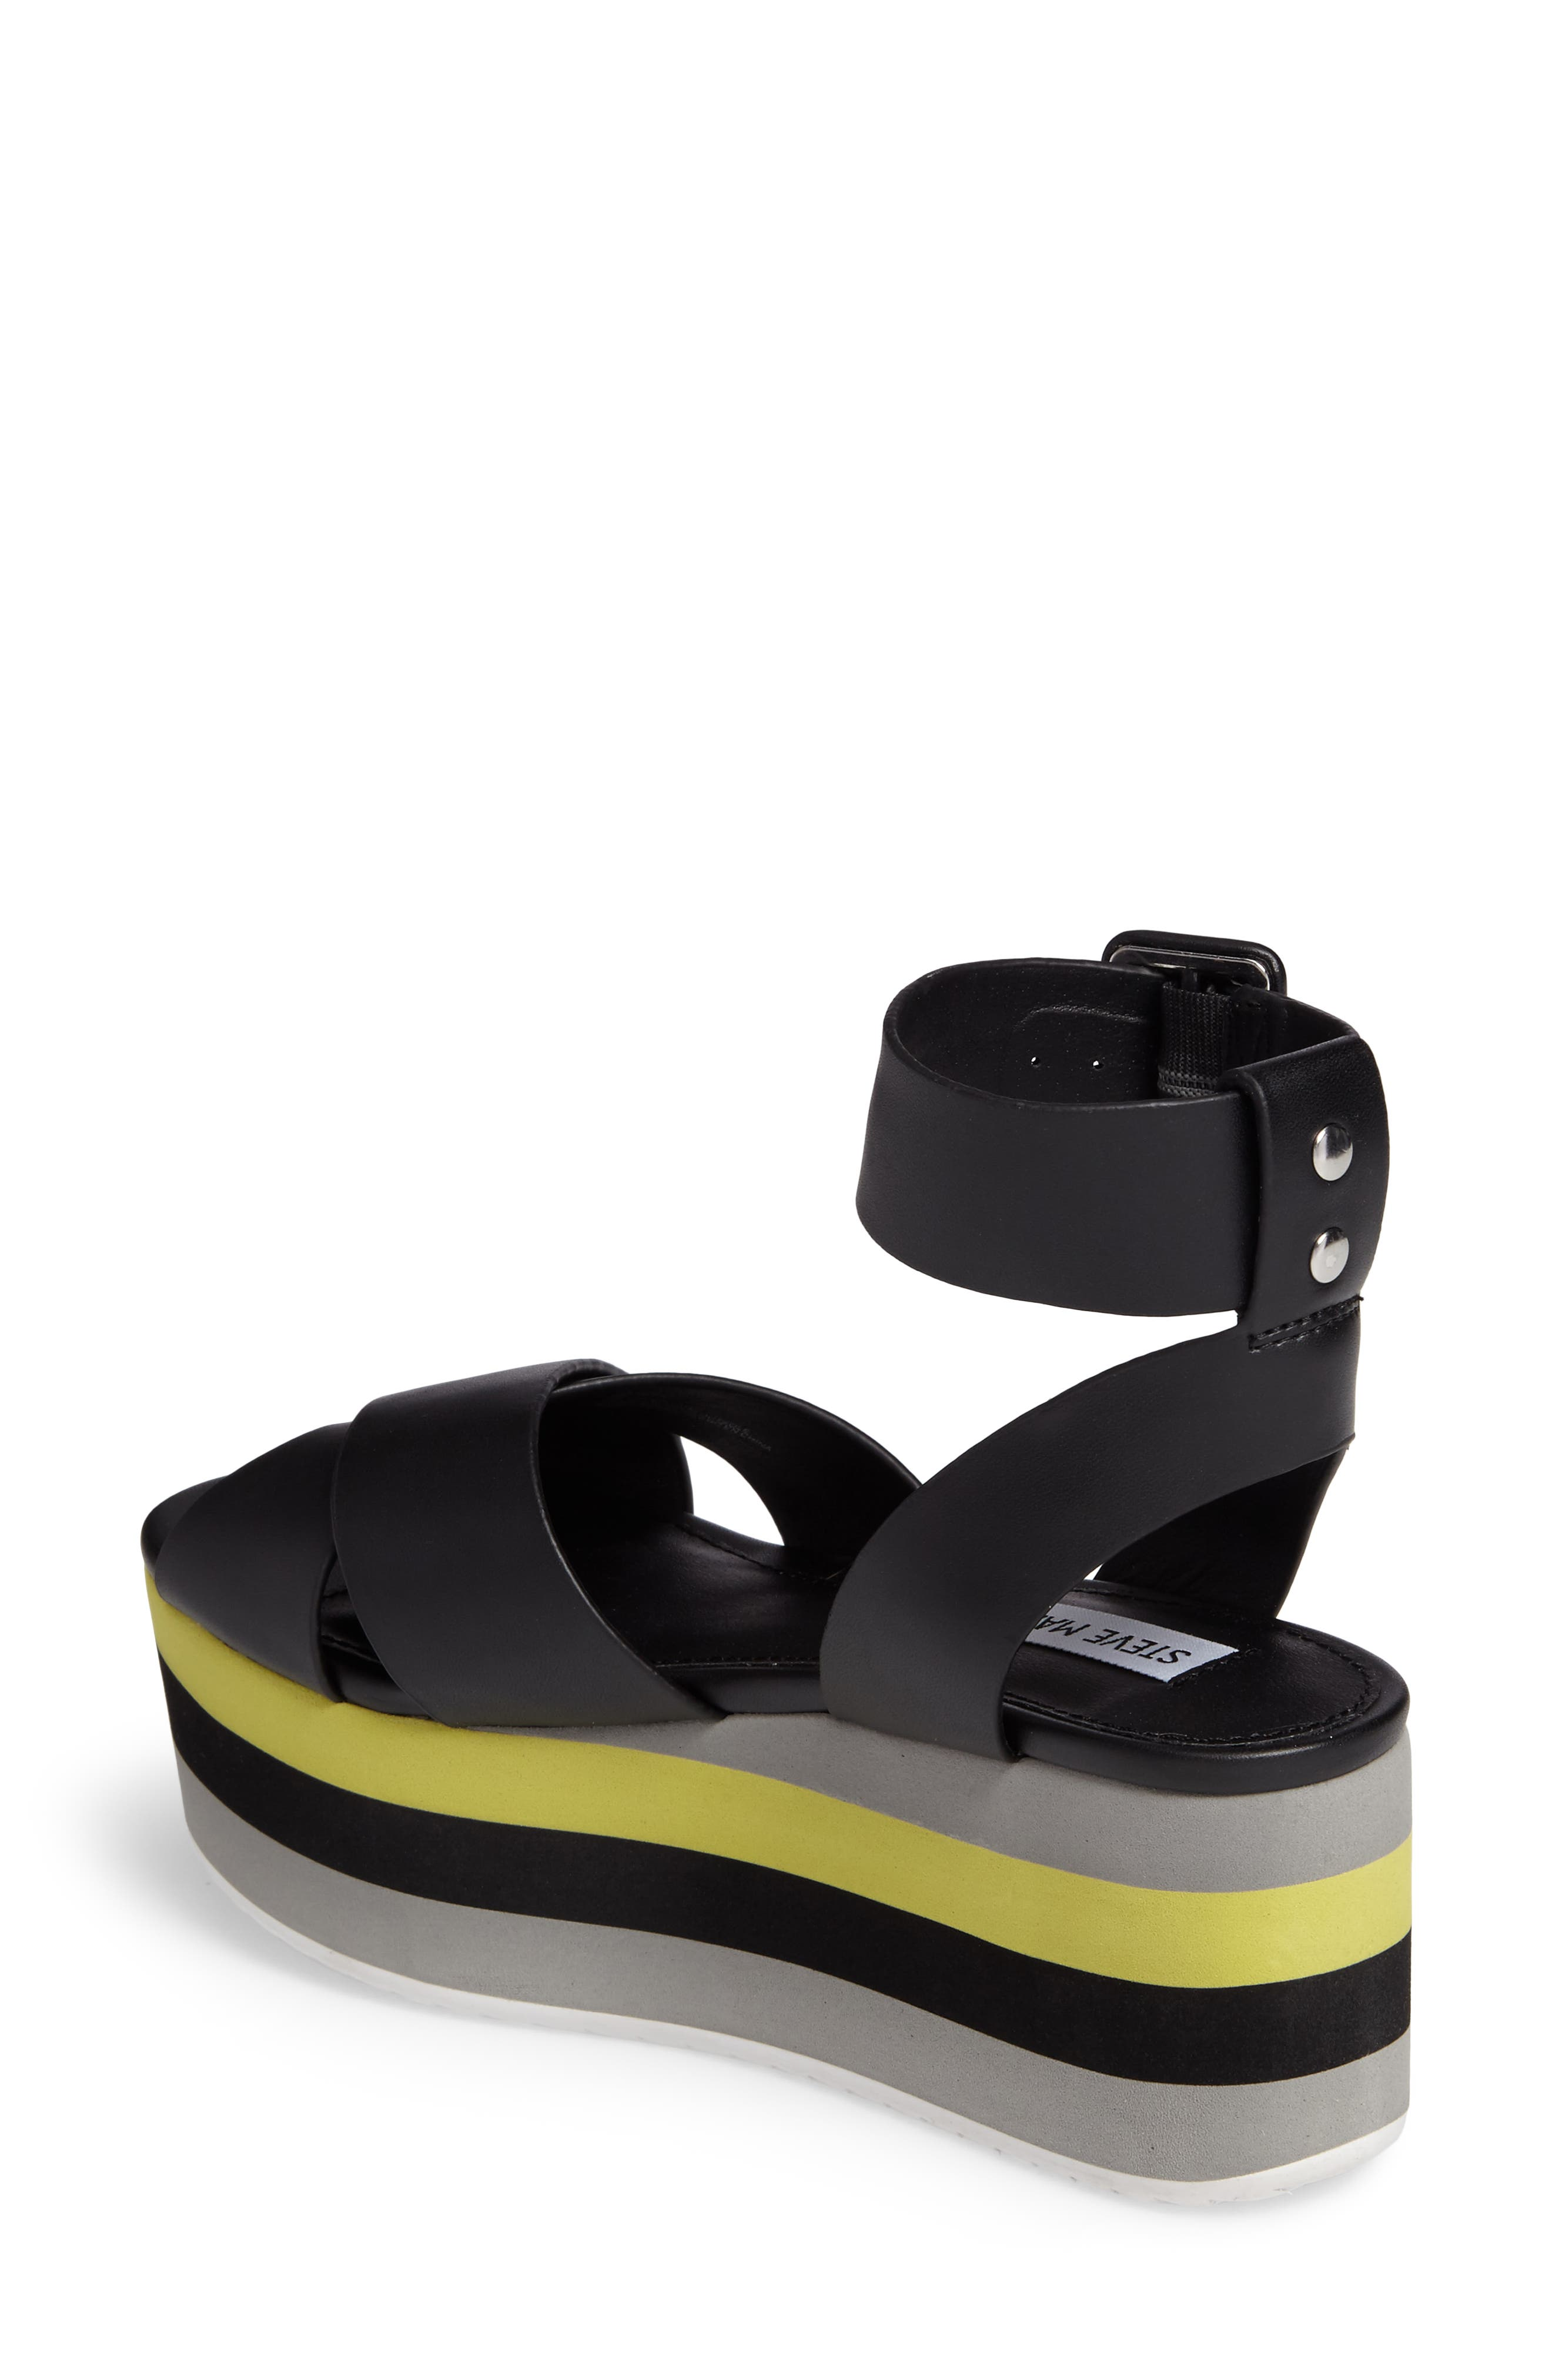 Macer Cuffed Platform Sandal,                             Alternate thumbnail 2, color,                             015